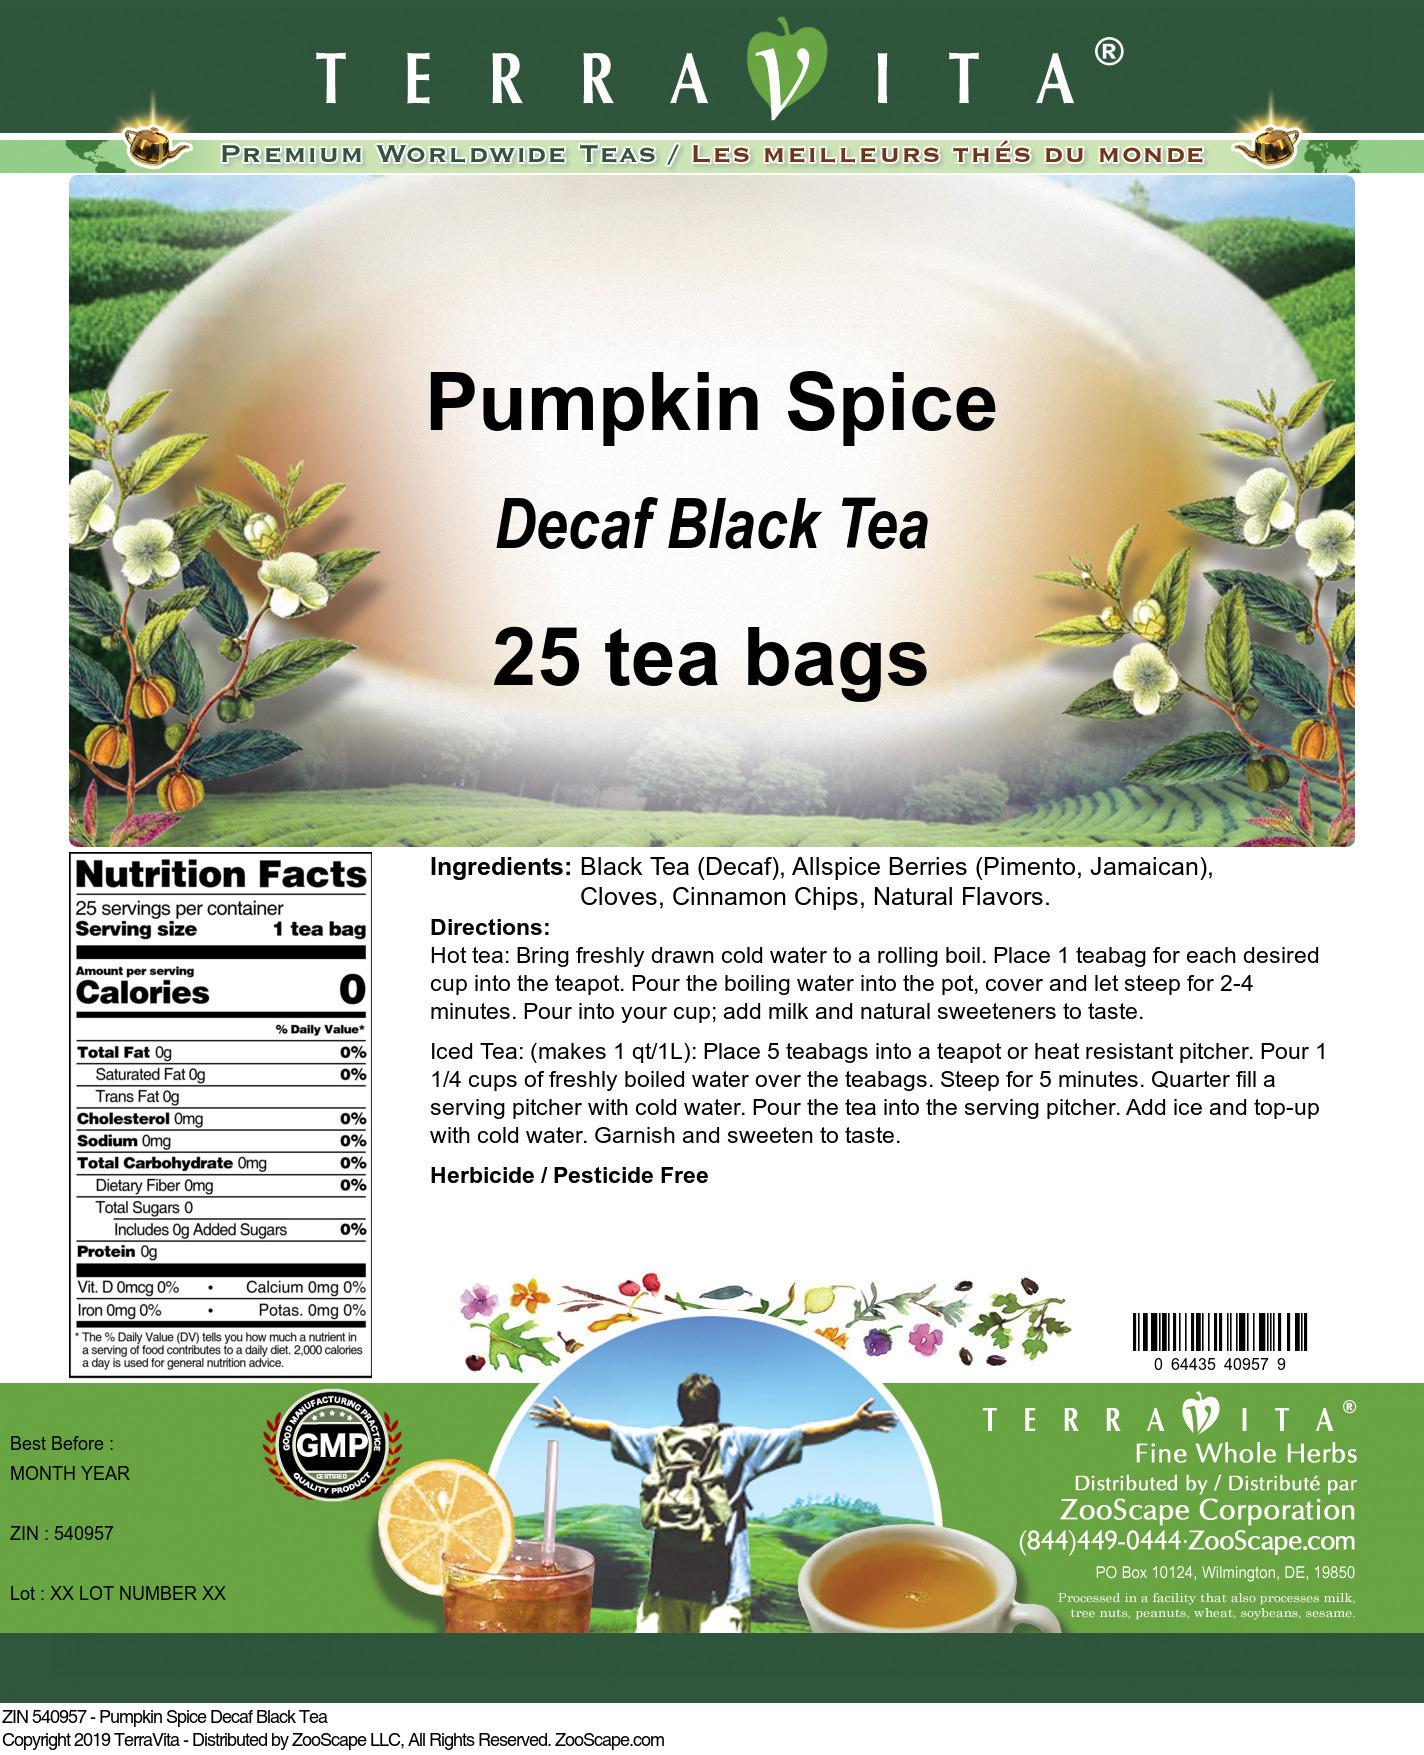 Pumpkin Spice Decaf Black Tea